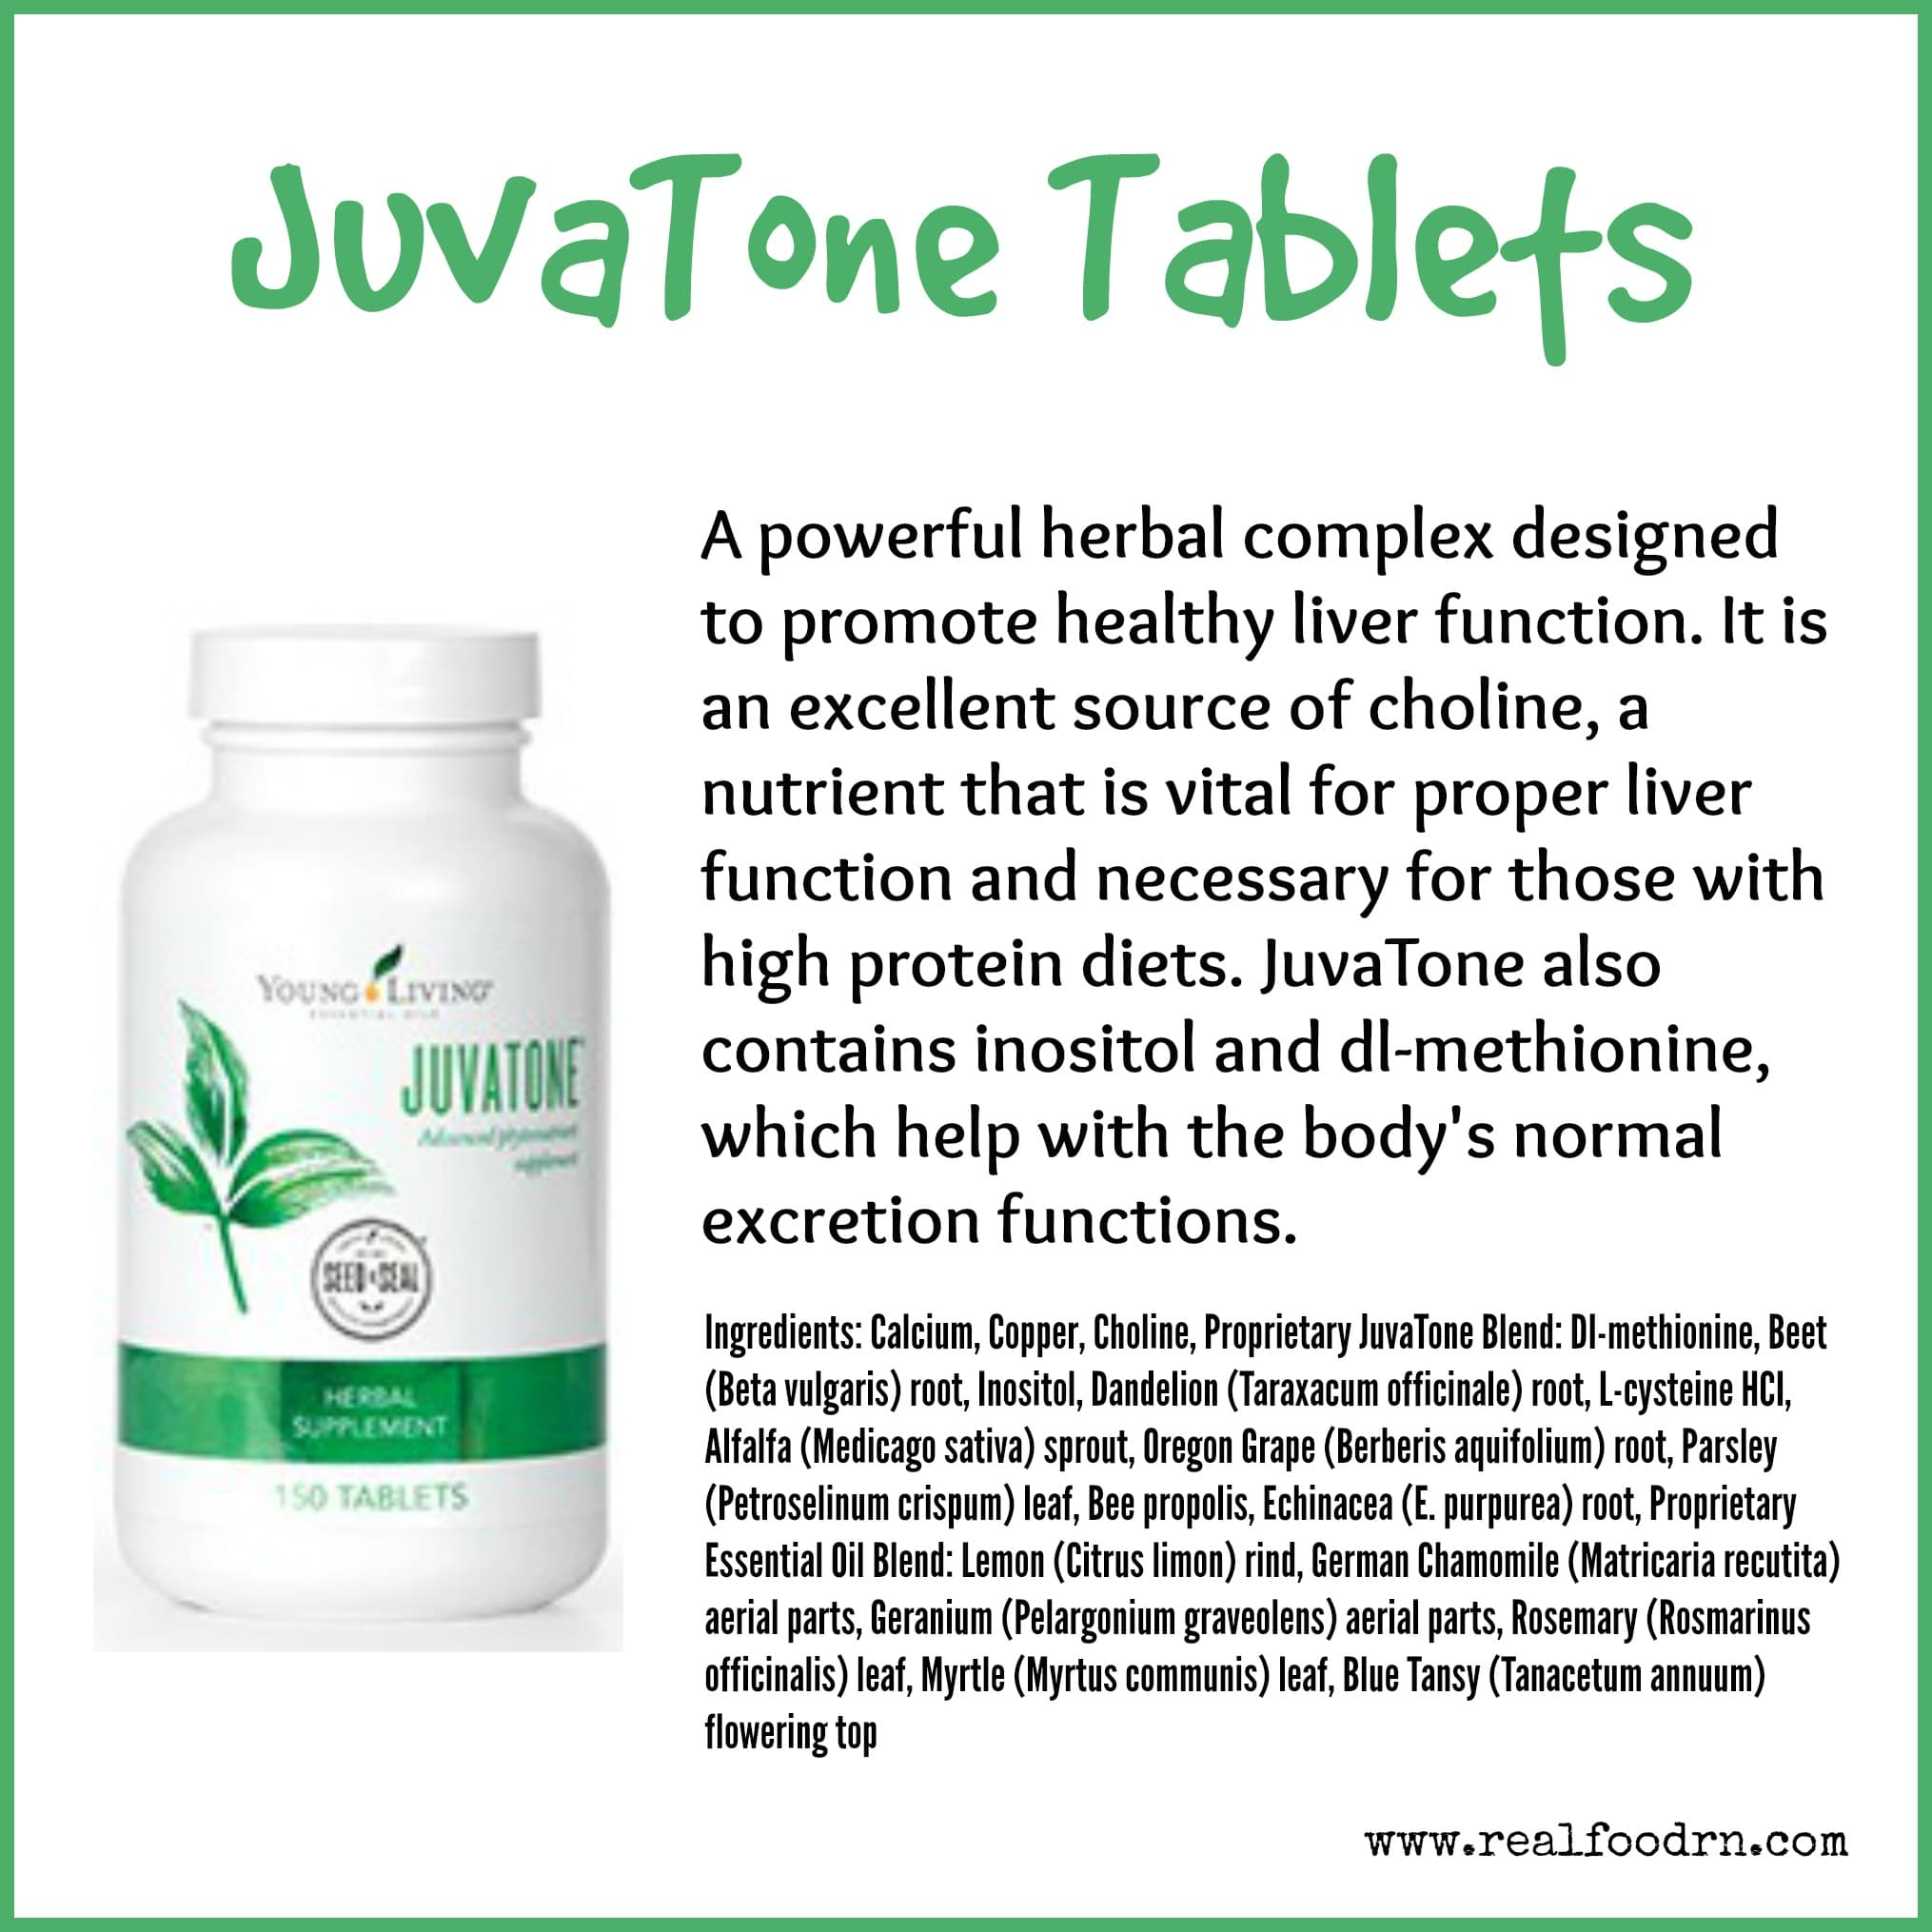 JuvaTone Tablets